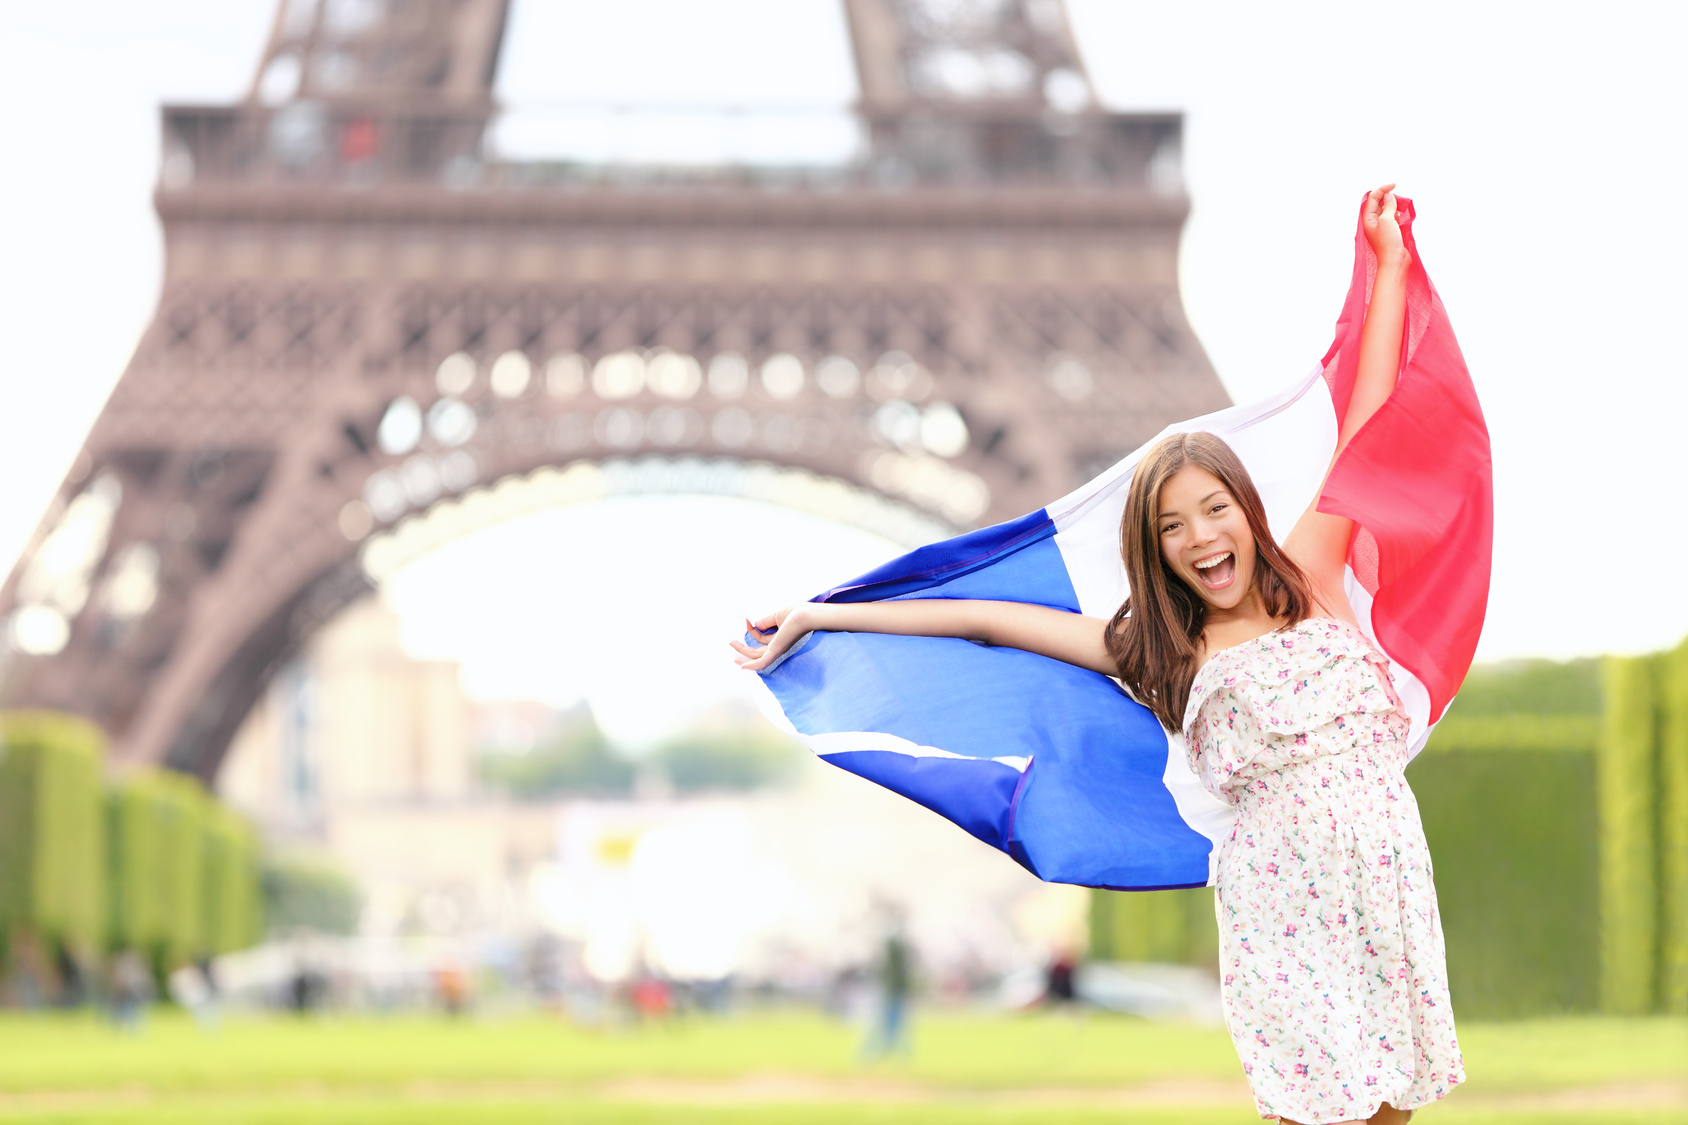 Women's Day in France